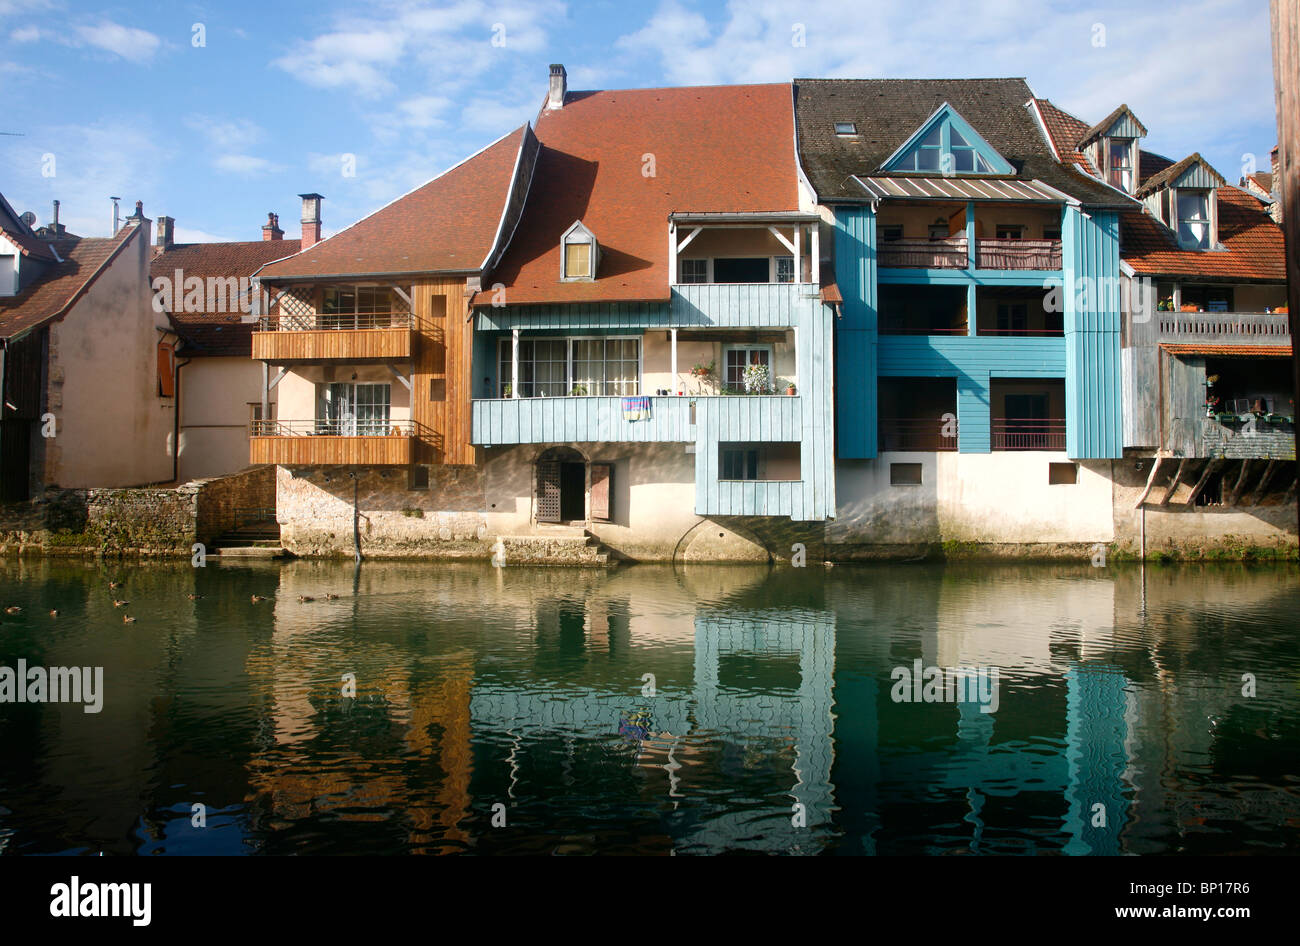 France, Franche-Comté, Doubs (25), La Loue valley, Ornans, old hopuse and Loue river - Stock Image